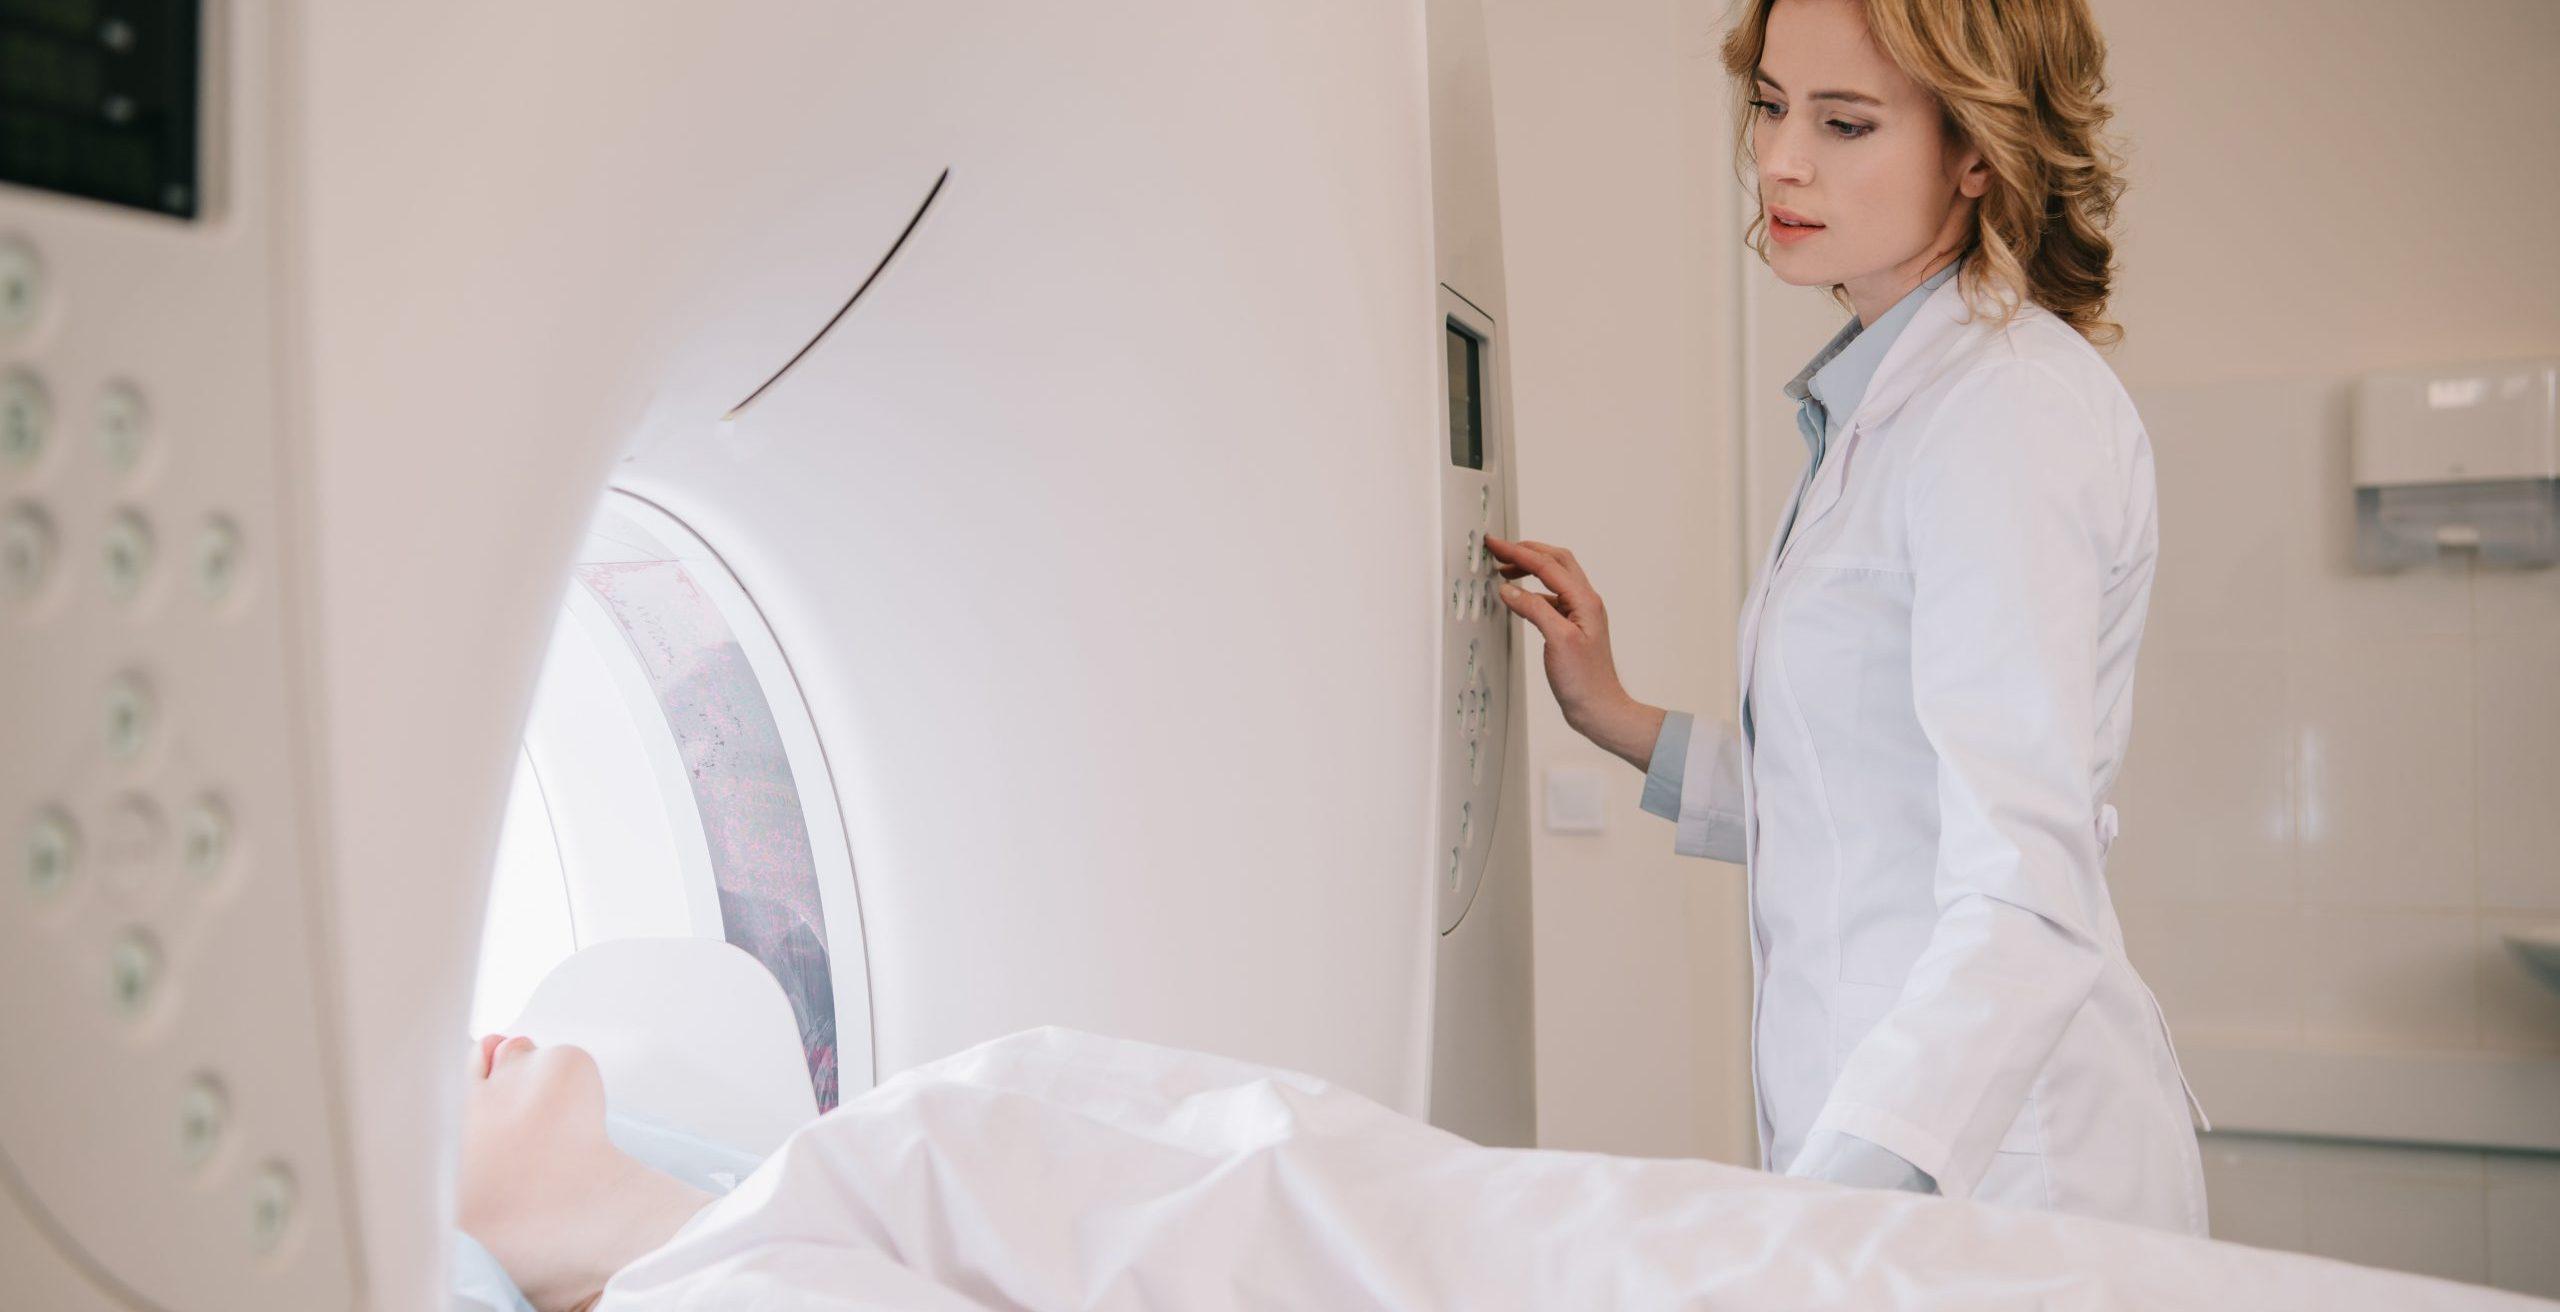 radiologist scanning patient in ct scanner